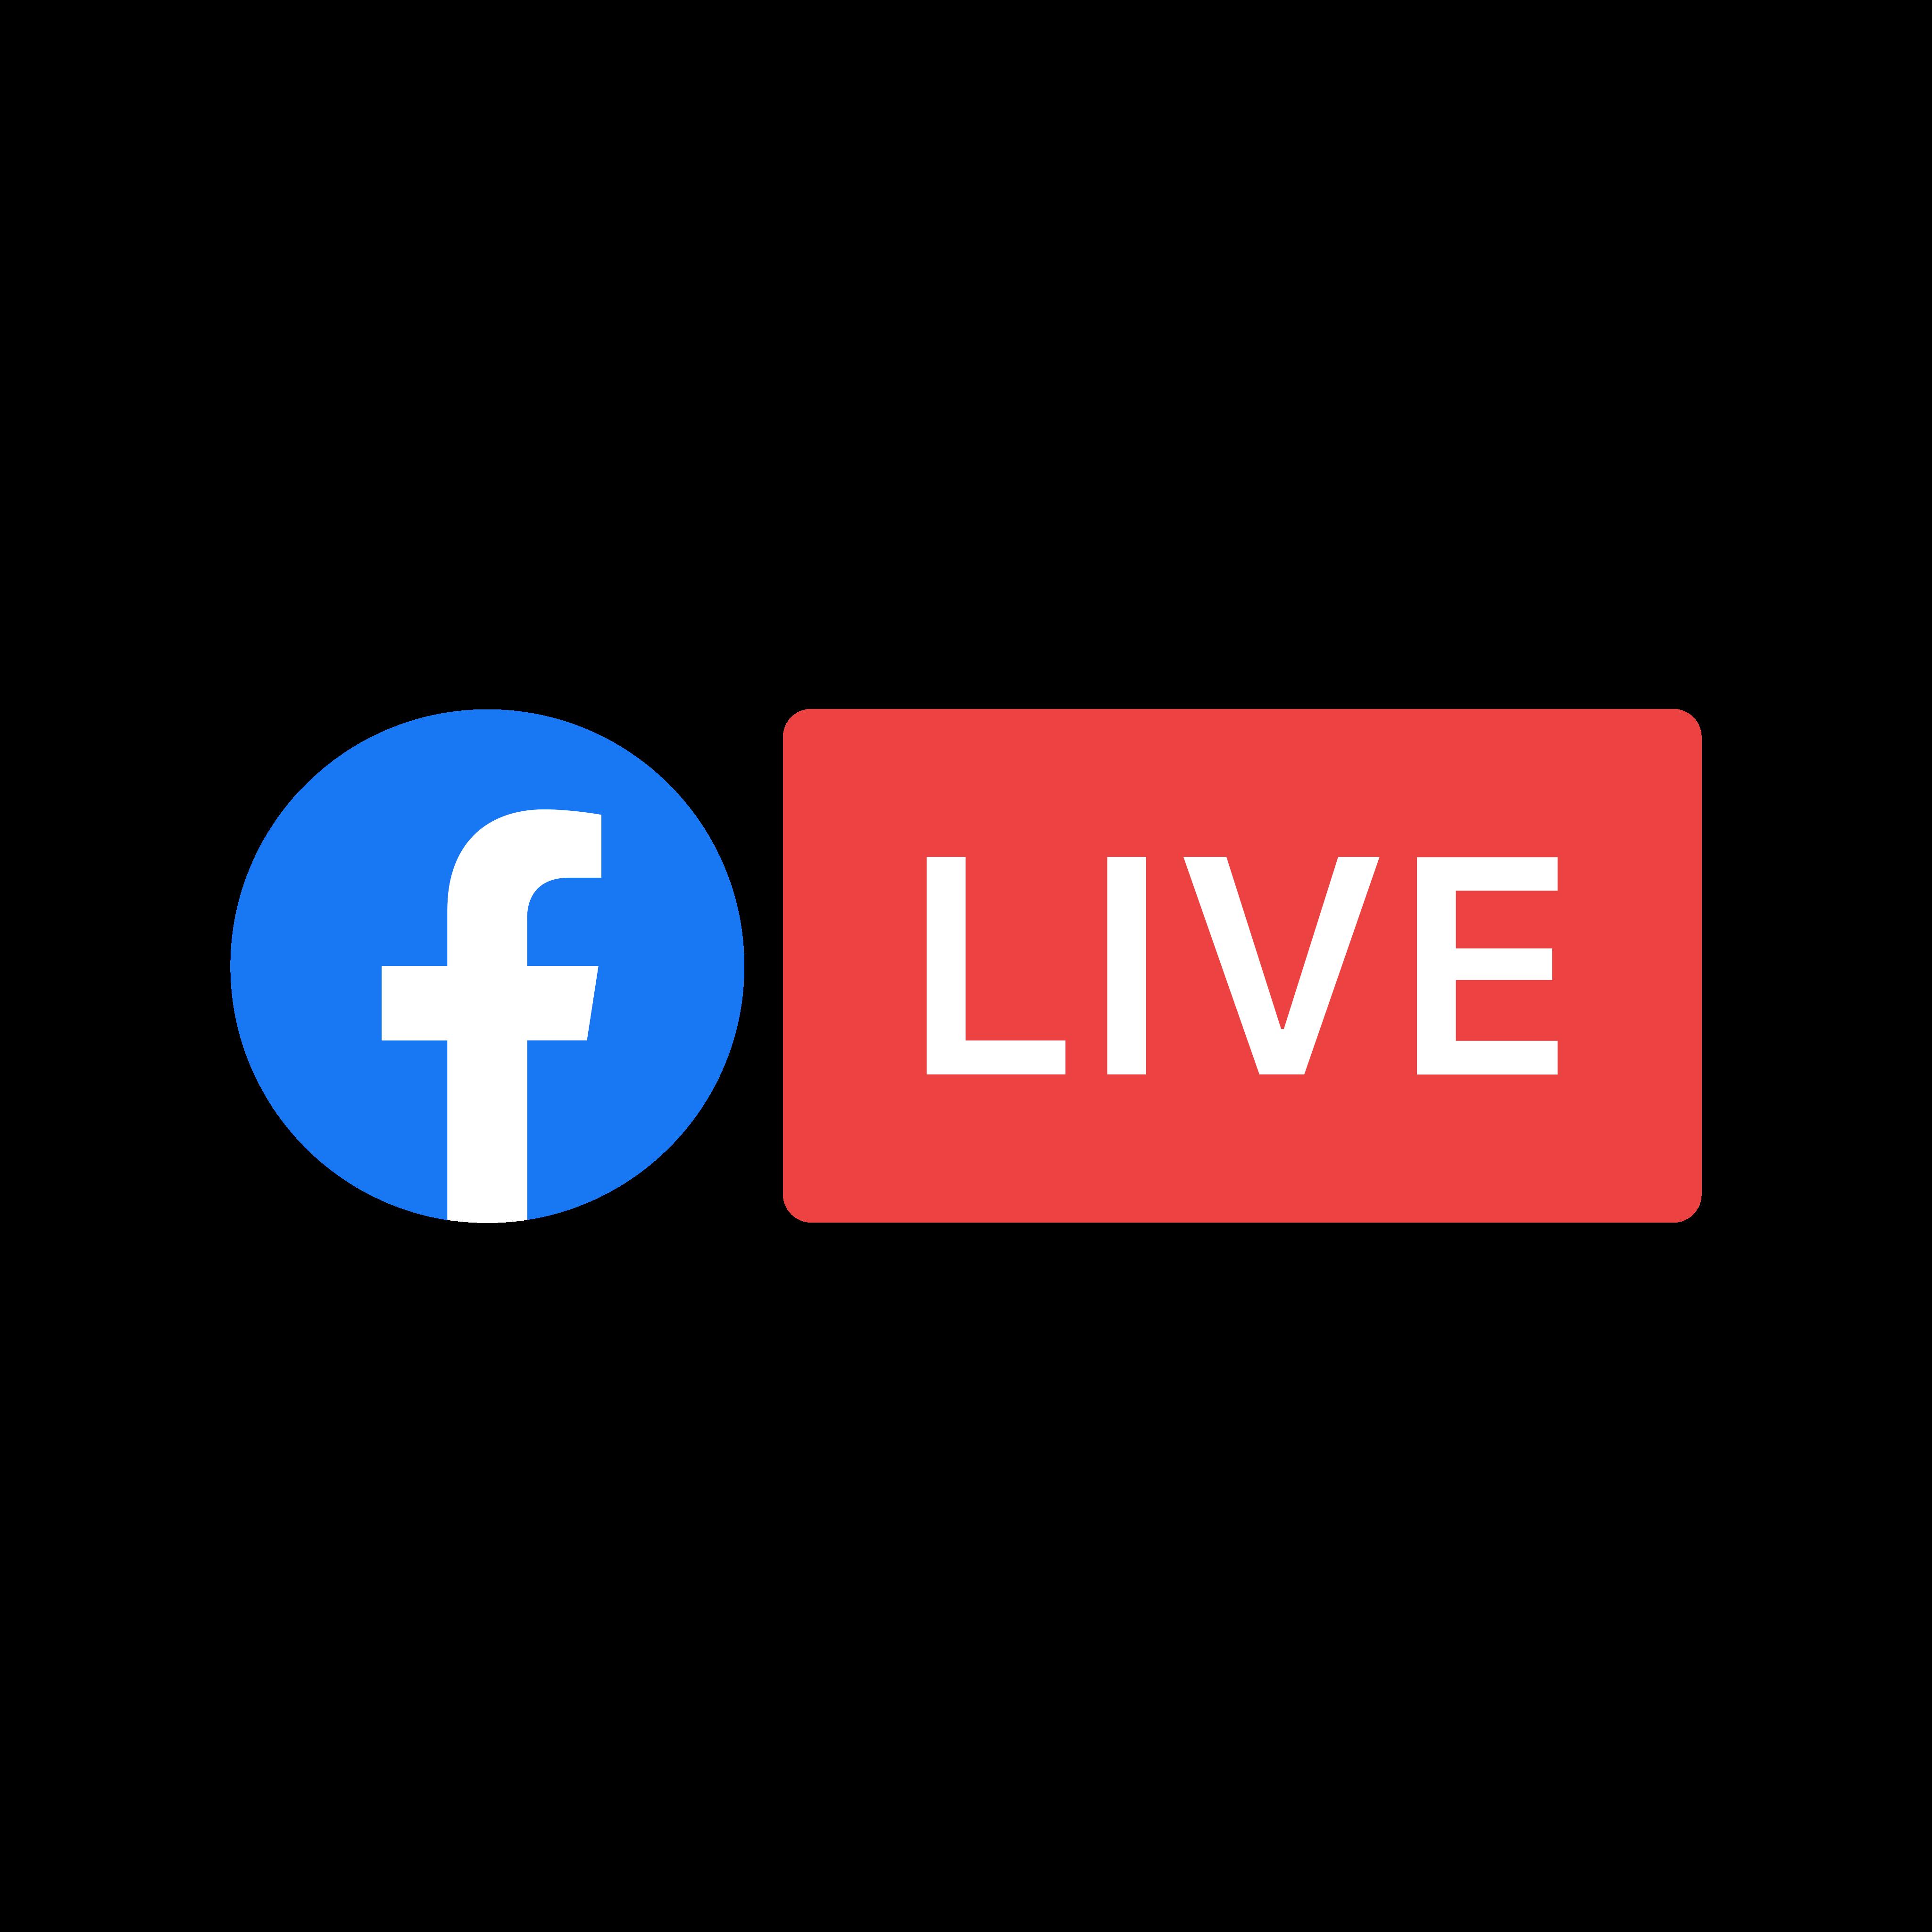 facebook live logo 0 - Facebook Live Logo